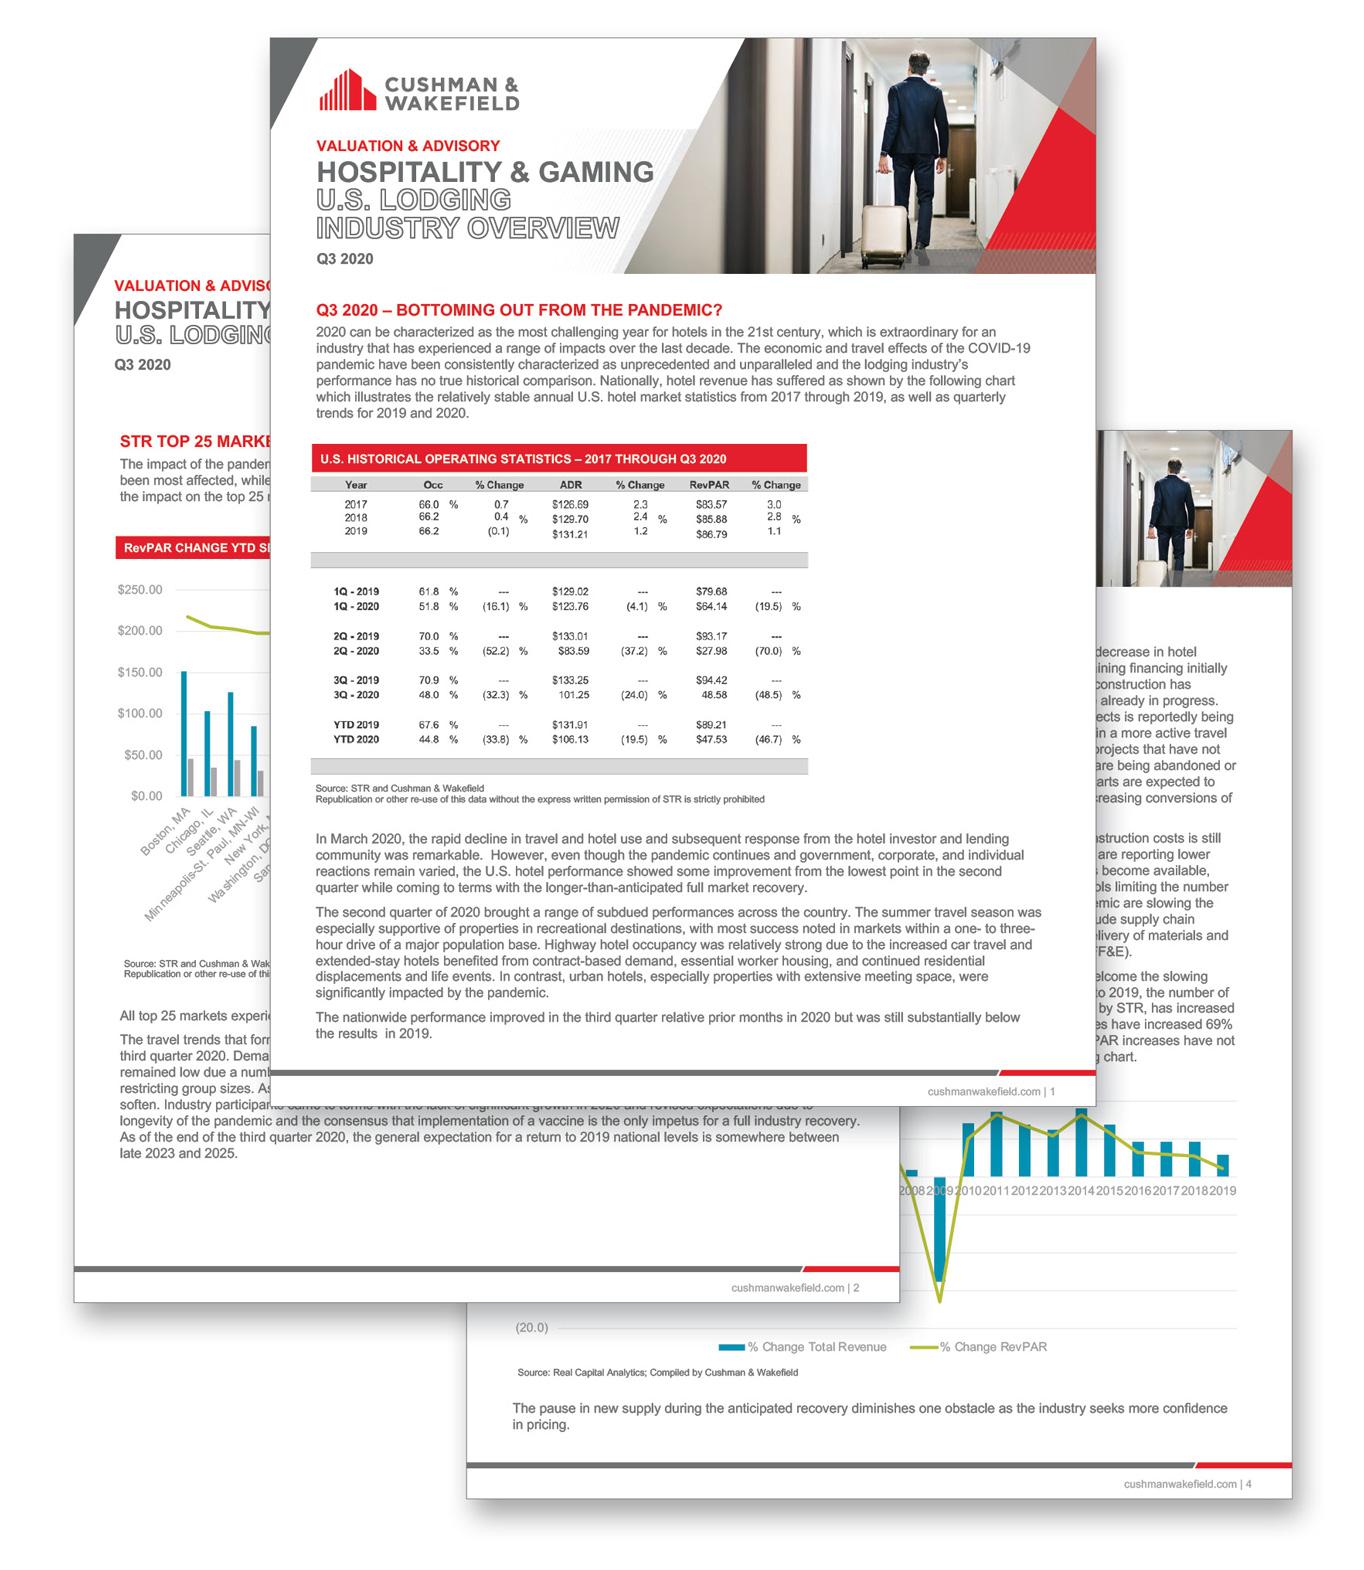 VA Hospitality Q3 2020 Report (image)